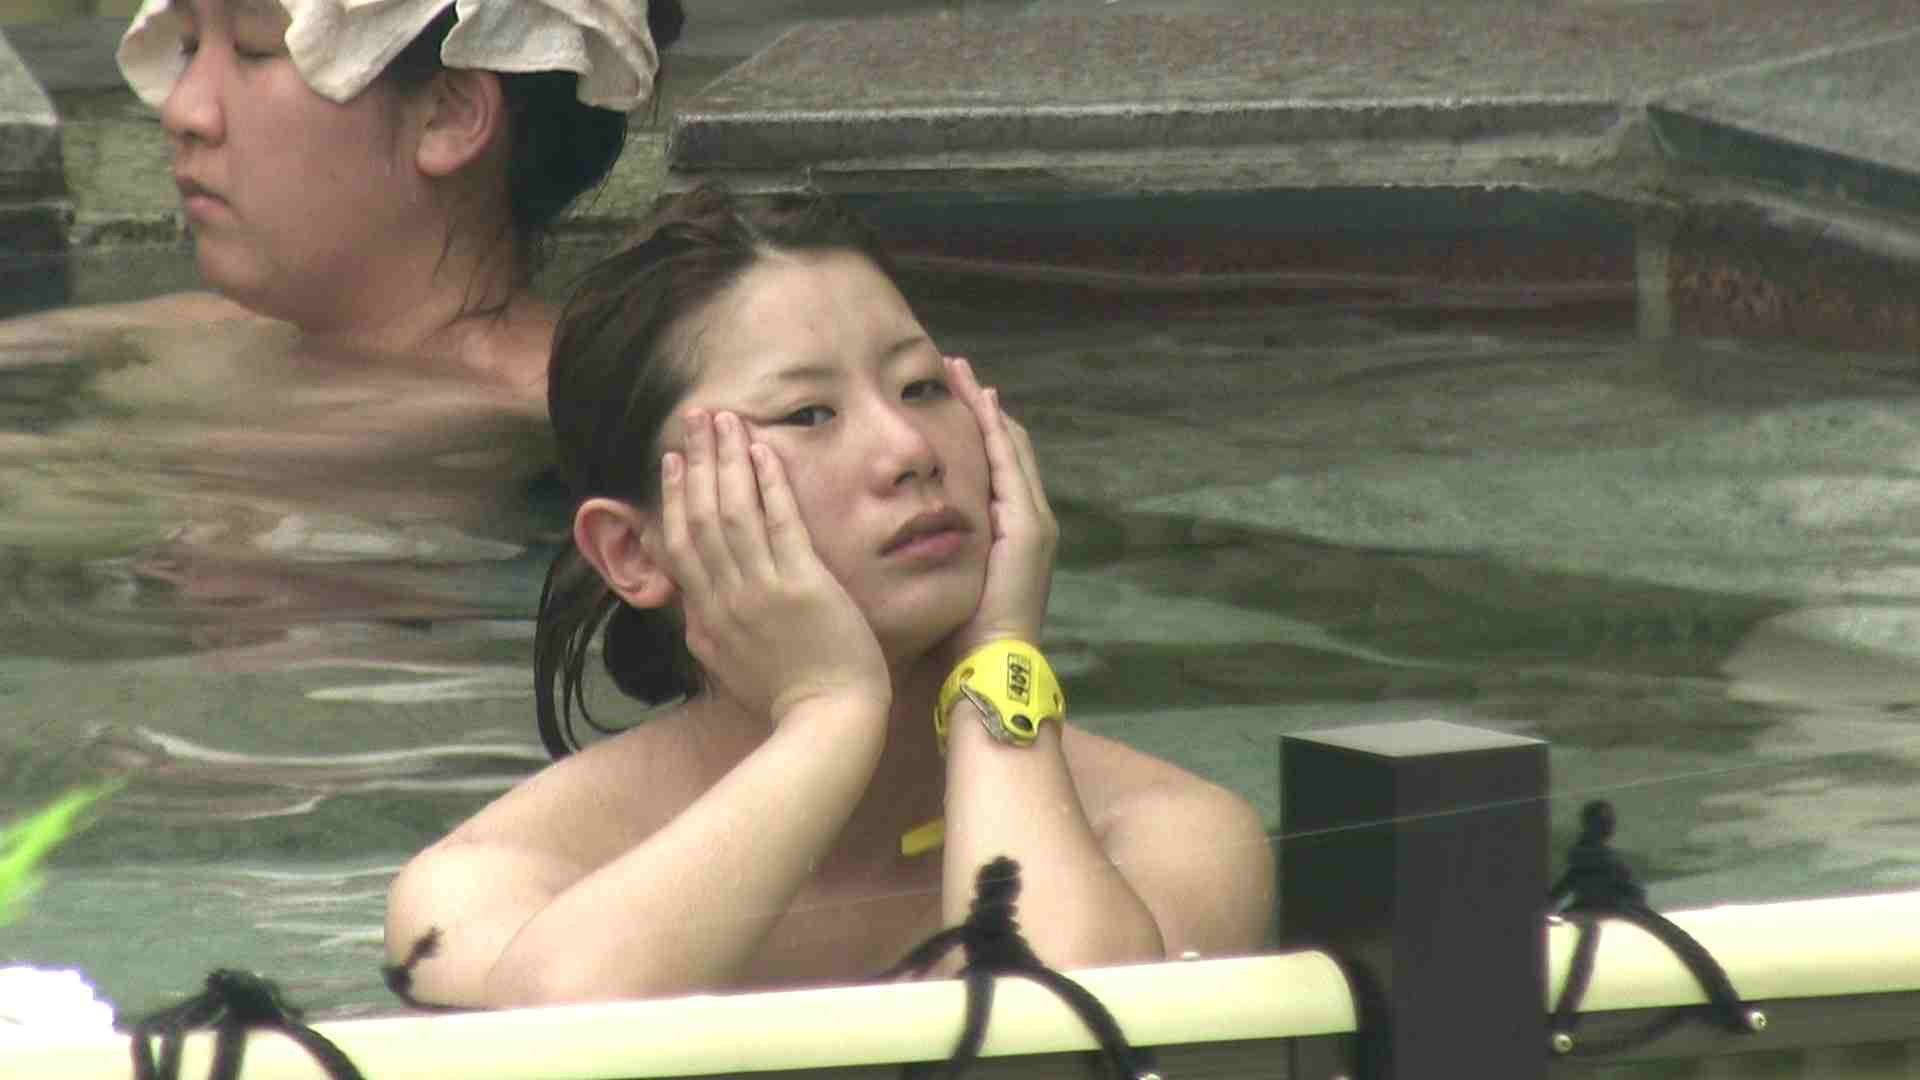 Aquaな露天風呂Vol.19【VIP】 盗撮 | HなOL  88pic 7